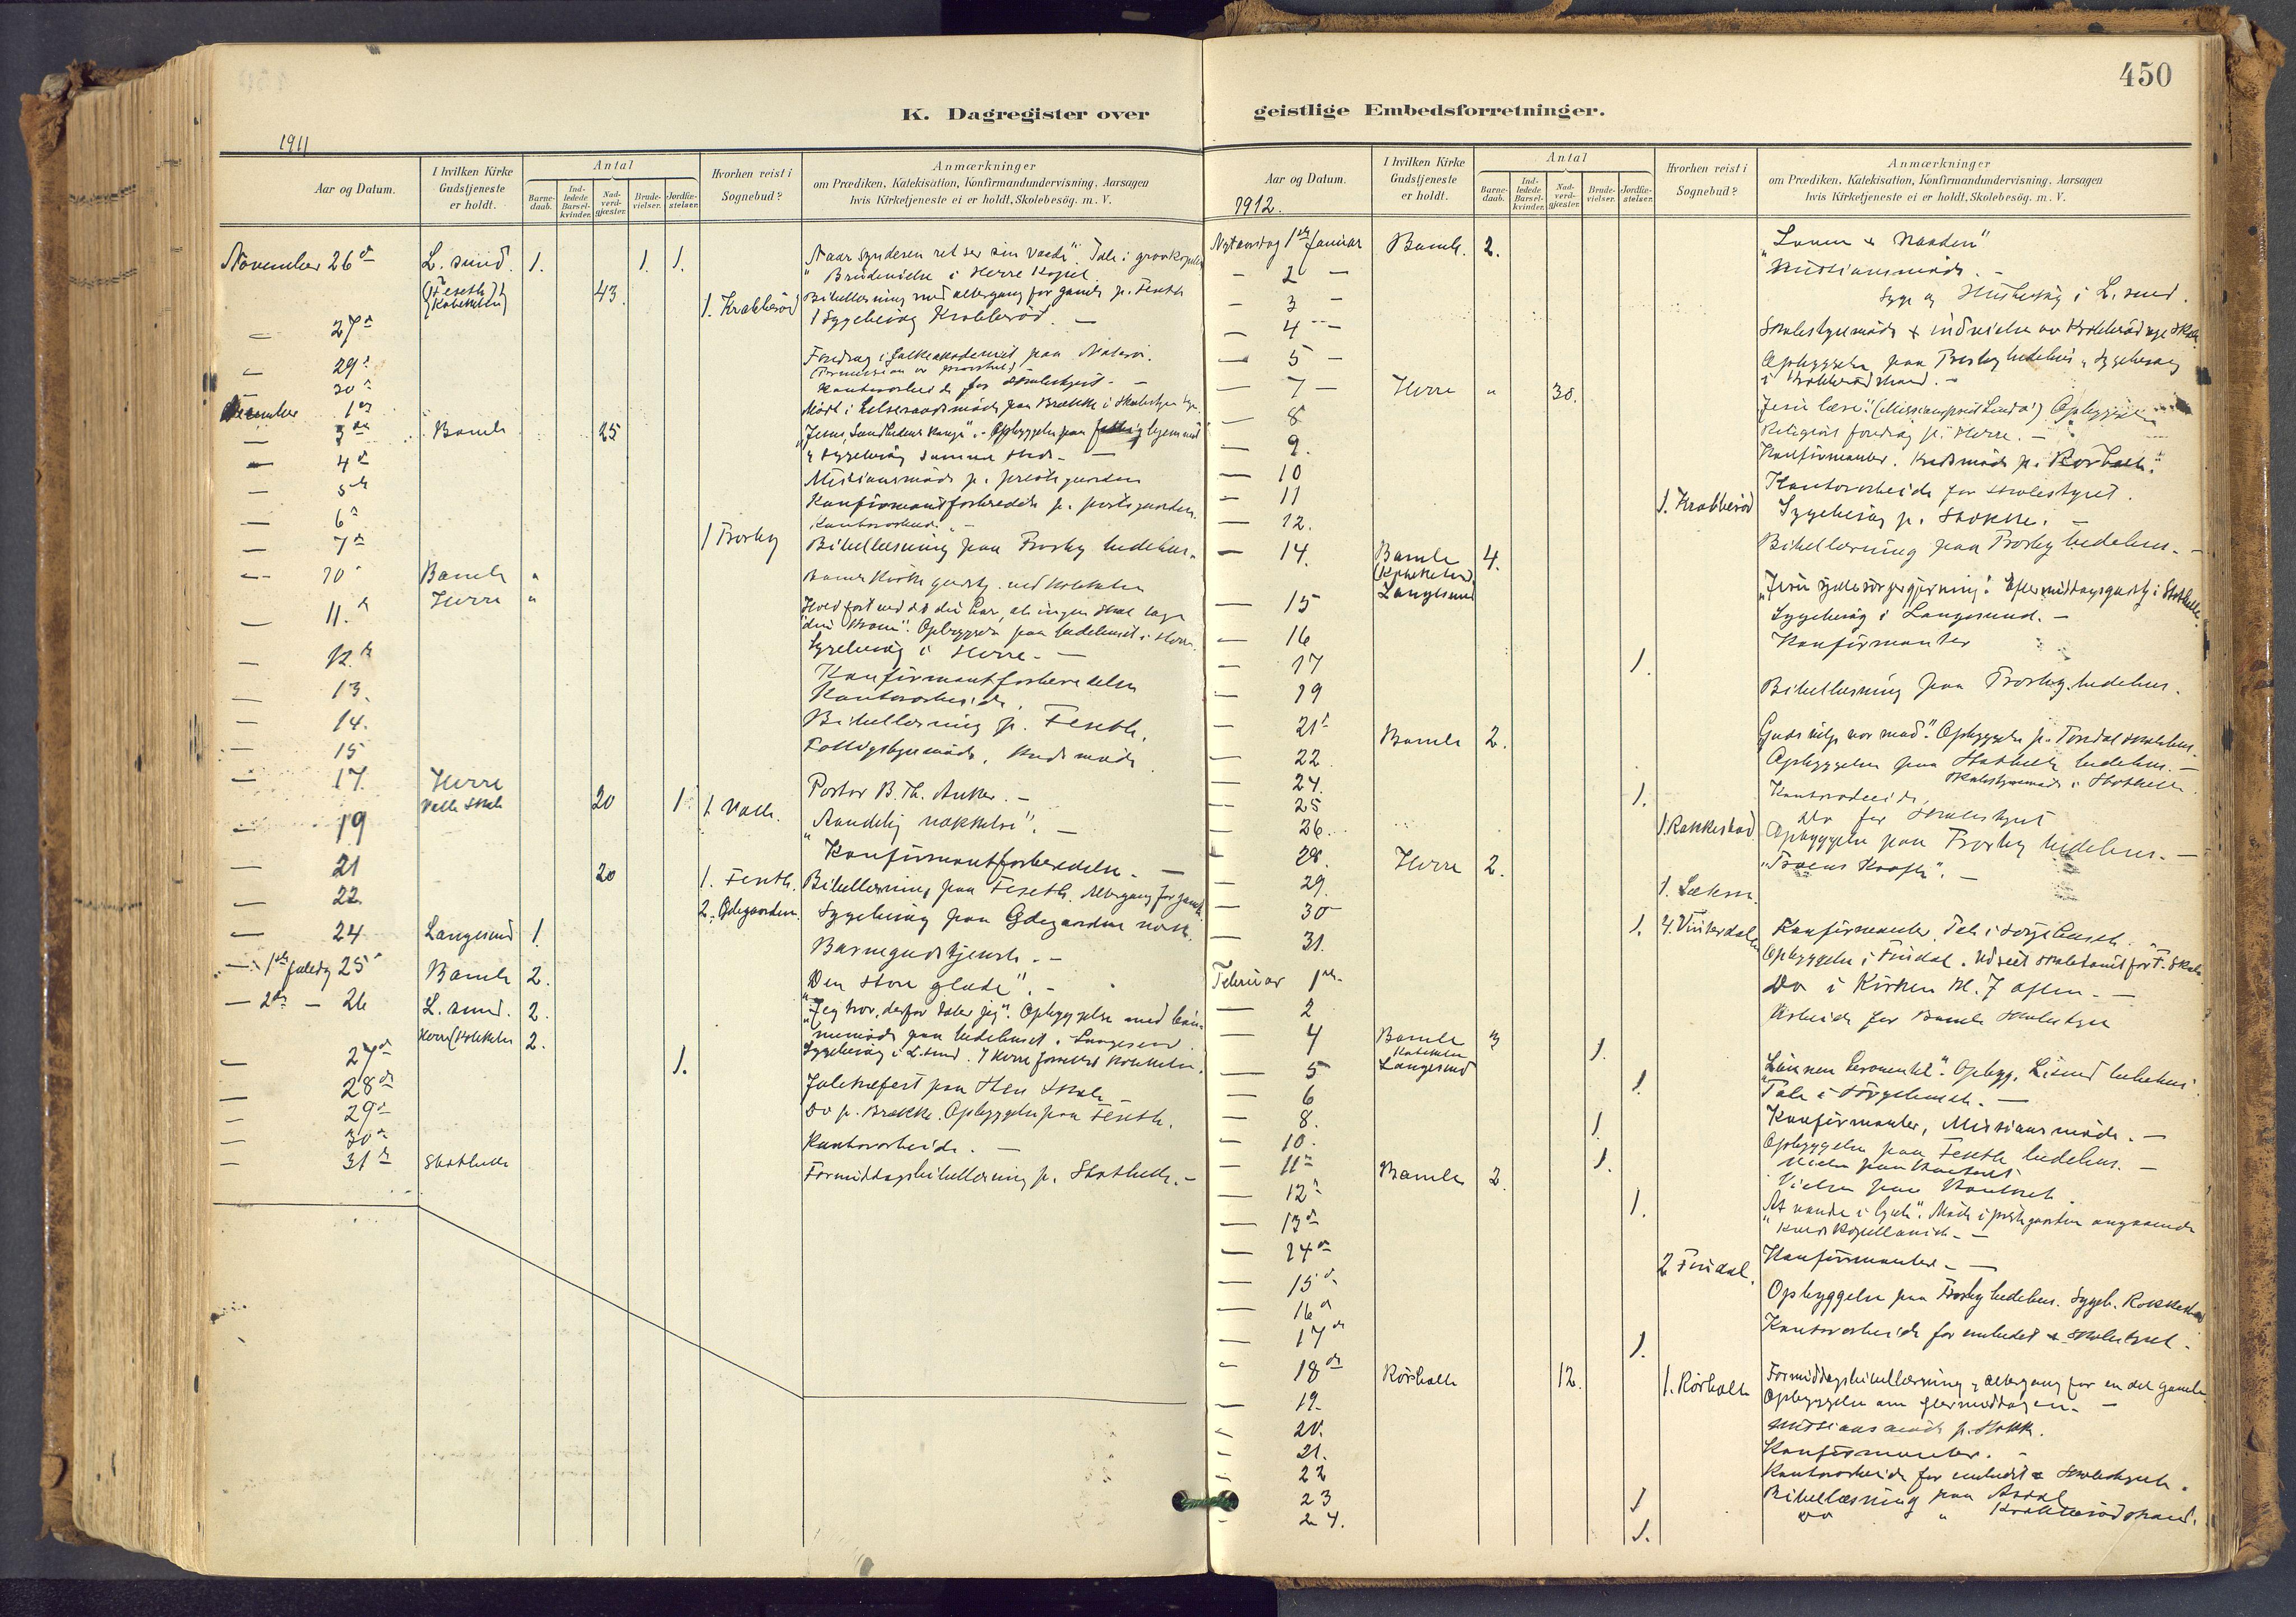 SAKO, Bamble kirkebøker, F/Fa/L0009: Ministerialbok nr. I 9, 1901-1917, s. 450